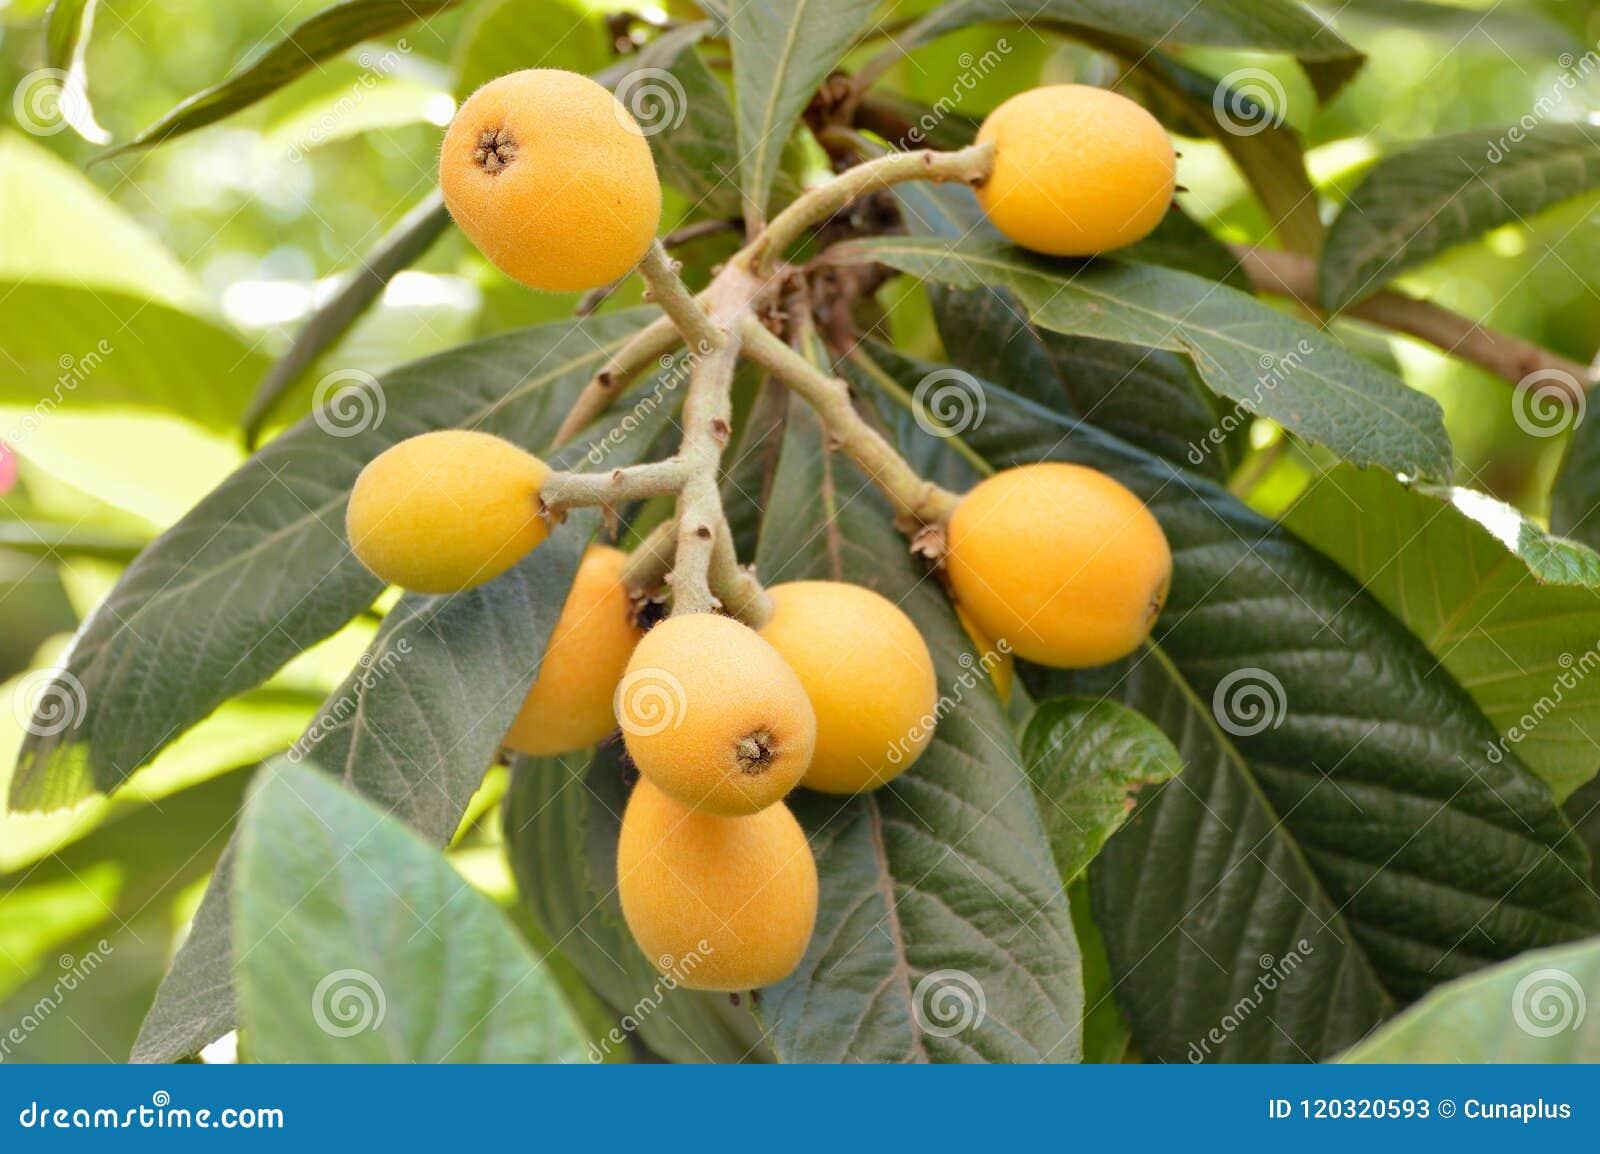 Loquat Fruit Tree Images